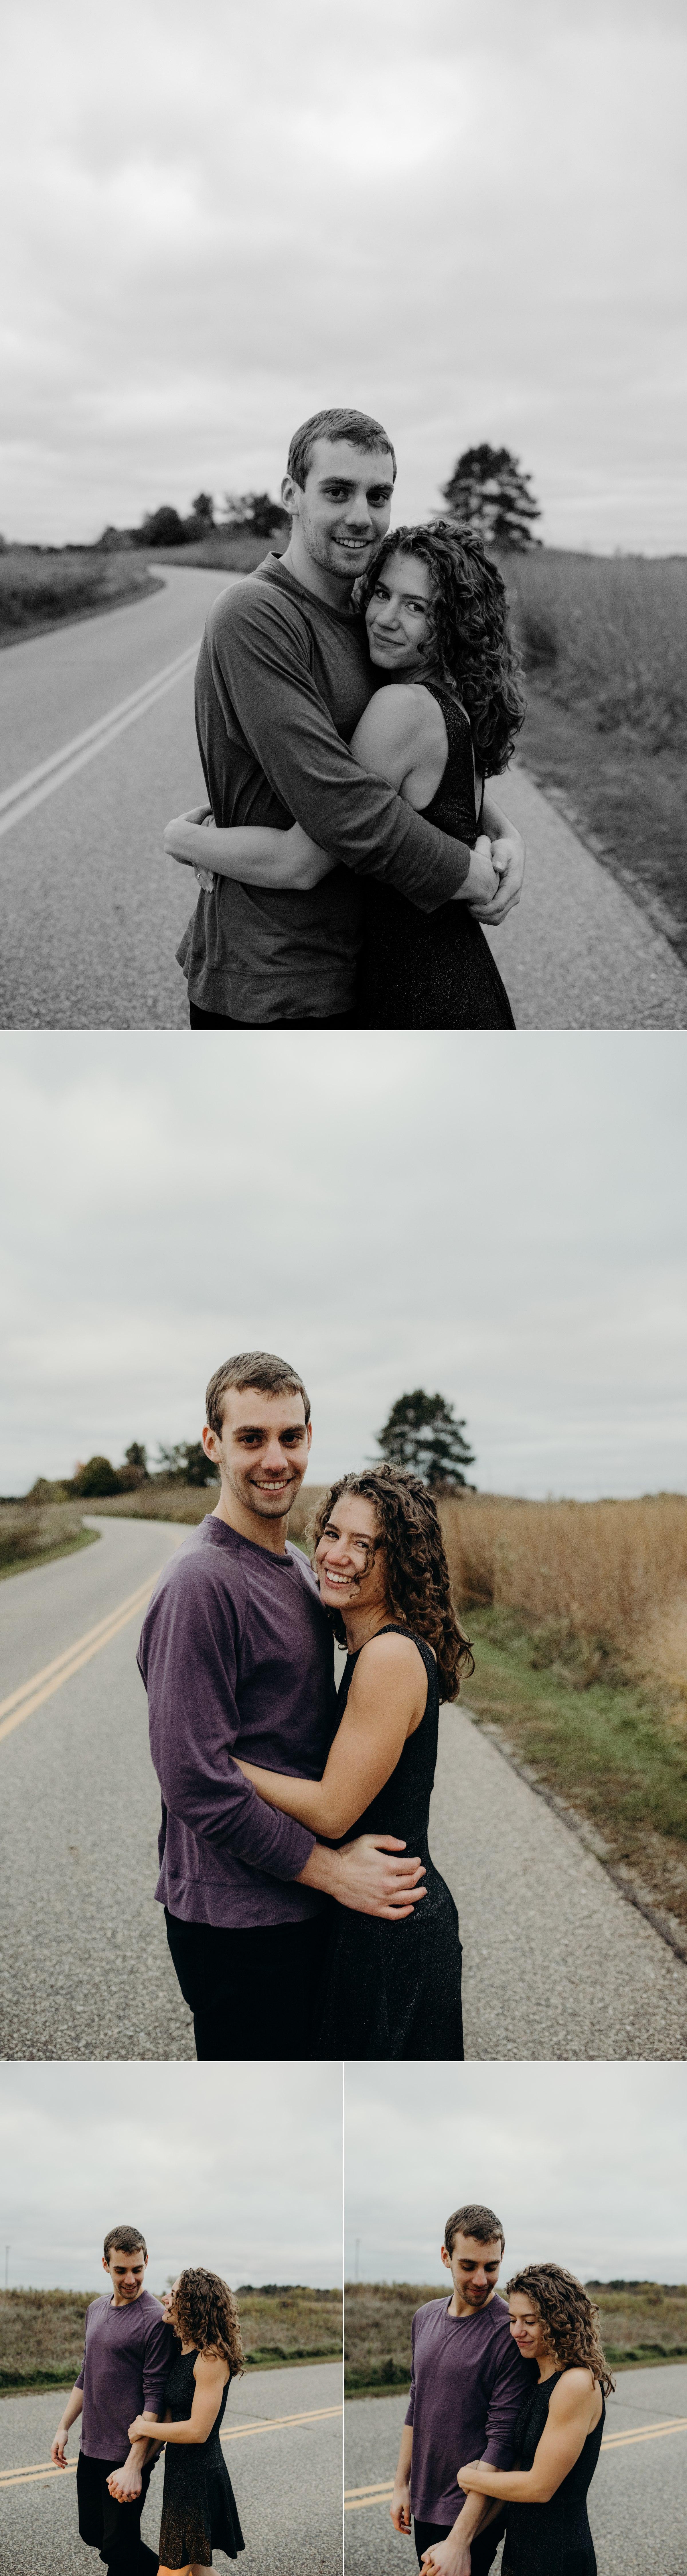 nickmezaphotography-austin-minneapolis-wedding-photographer-elopement-best-intimate-adventurous-destination-texas-minnesota-engagement-jess-dan-spacesaver_0191.jpg